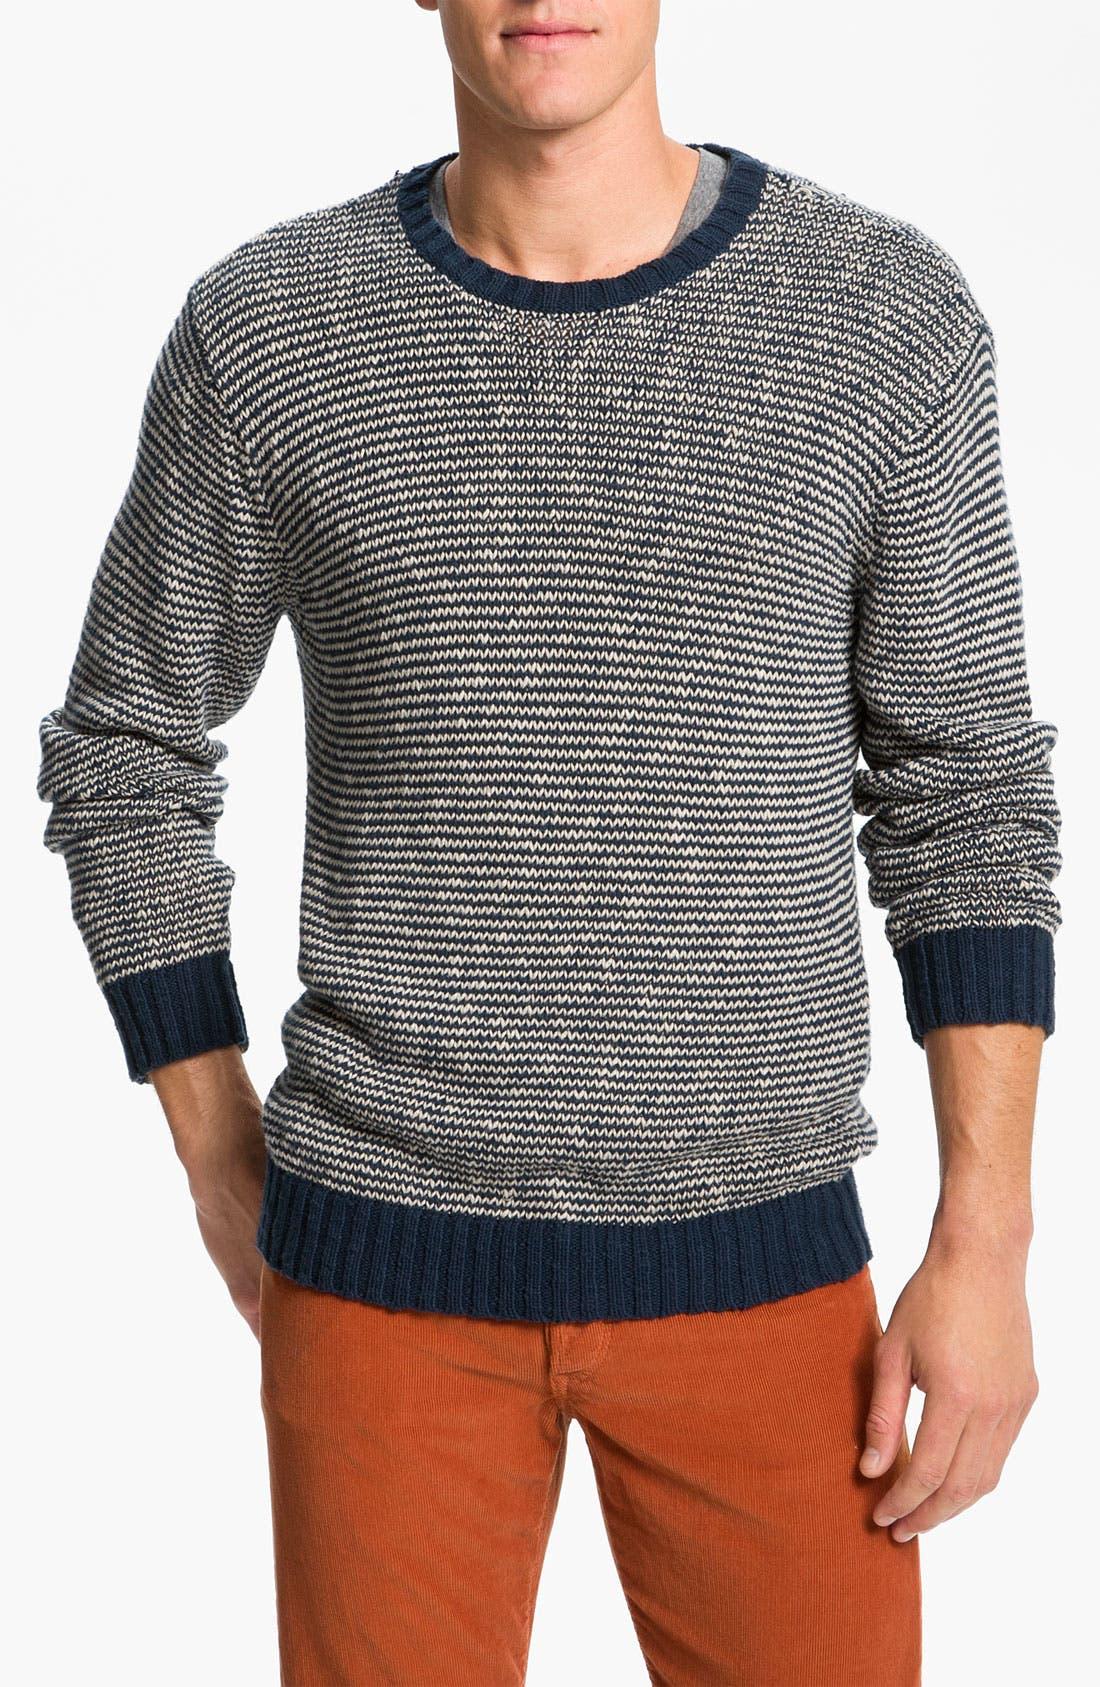 Main Image - VSTR 'Saltie' Stripe Crewneck Sweater